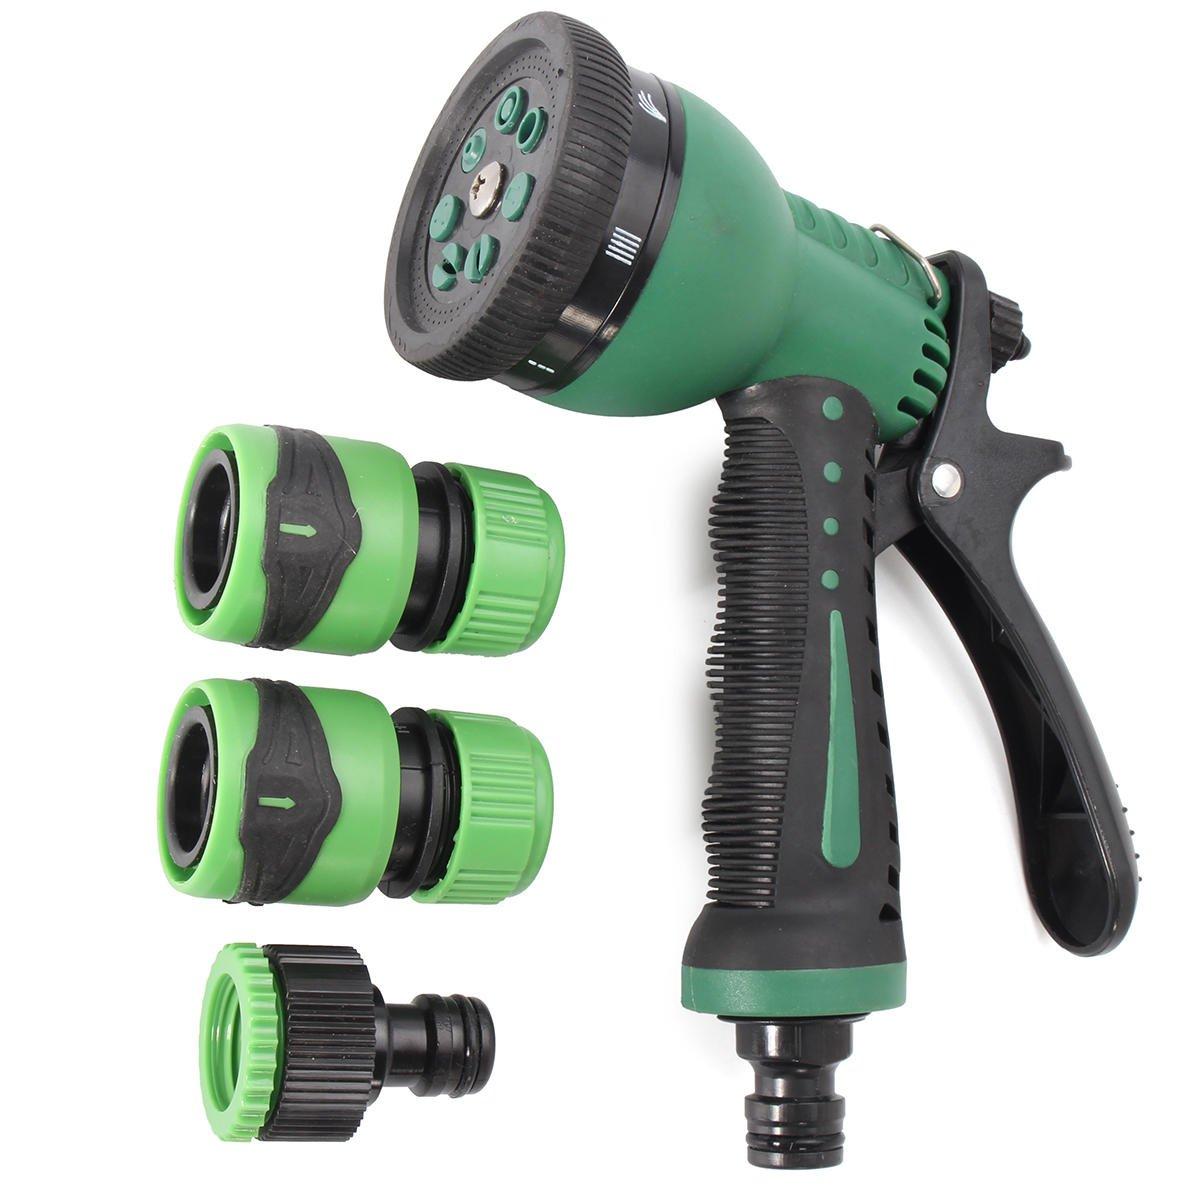 7 Pattern Hose Nozzle Sprayer Water Hose, Water Gun Watering Cleaning Tool